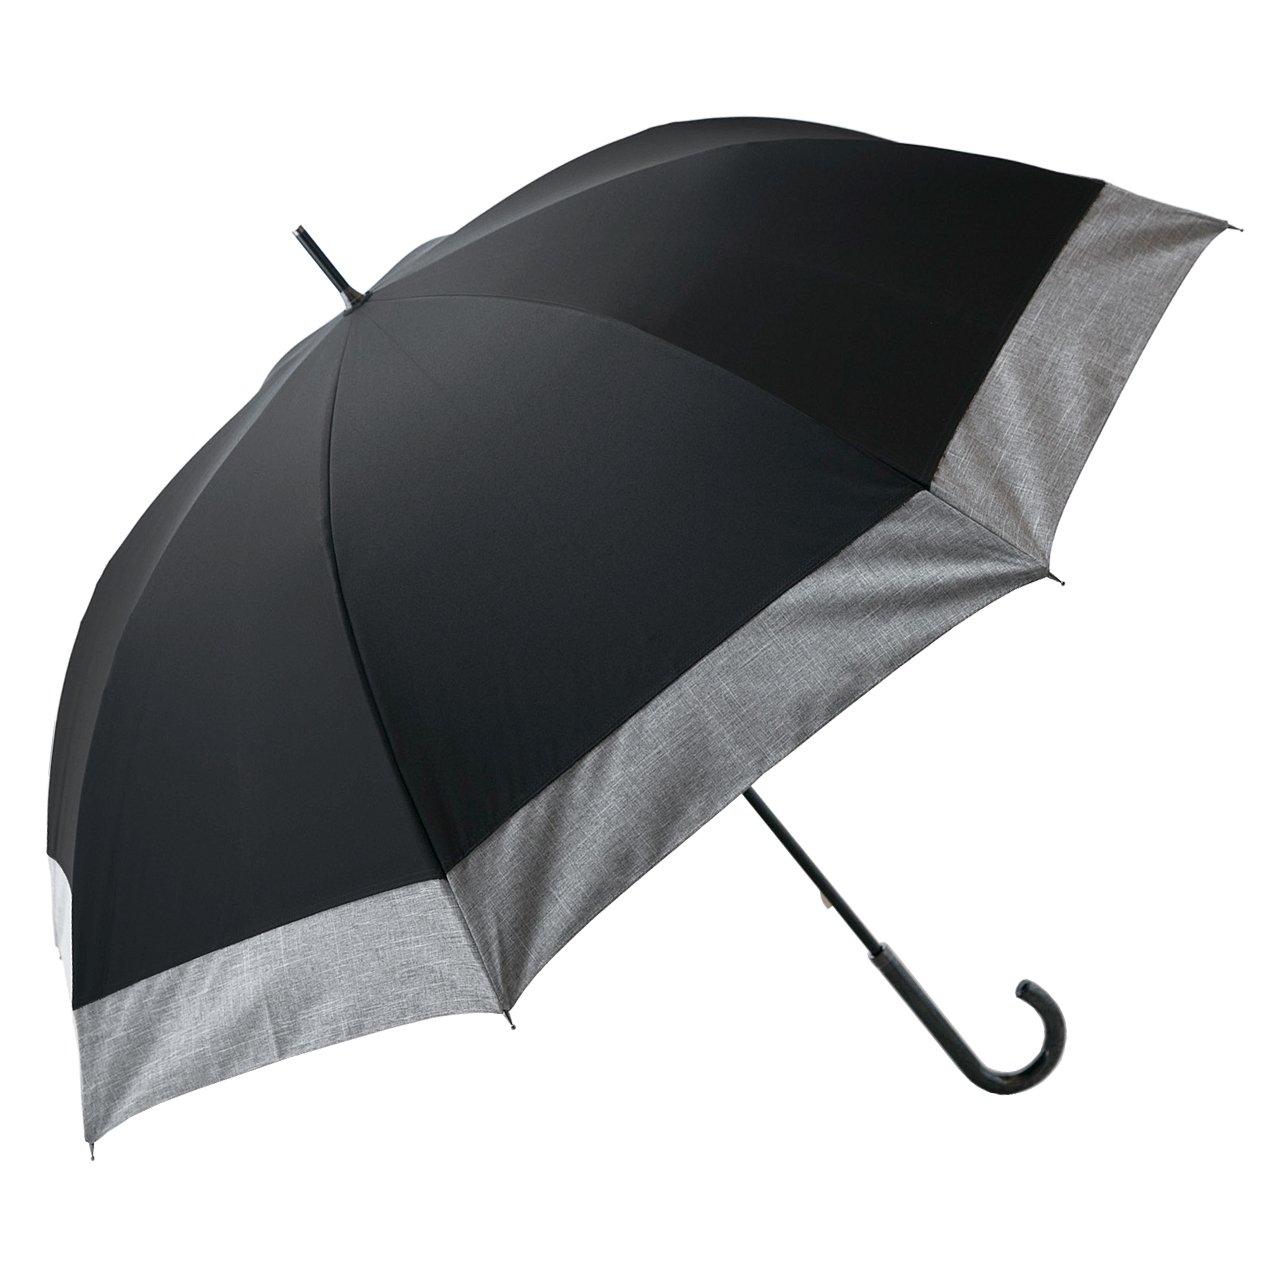 【Rose Blanc】100%完全遮光 日傘 コンビ 男女兼用 メンズサイズ ダンガリー 65cm (ブラック×ダンガリーグレー) B01F1SKKUK ブラック×ダンガリーグレー ブラック×ダンガリーグレー